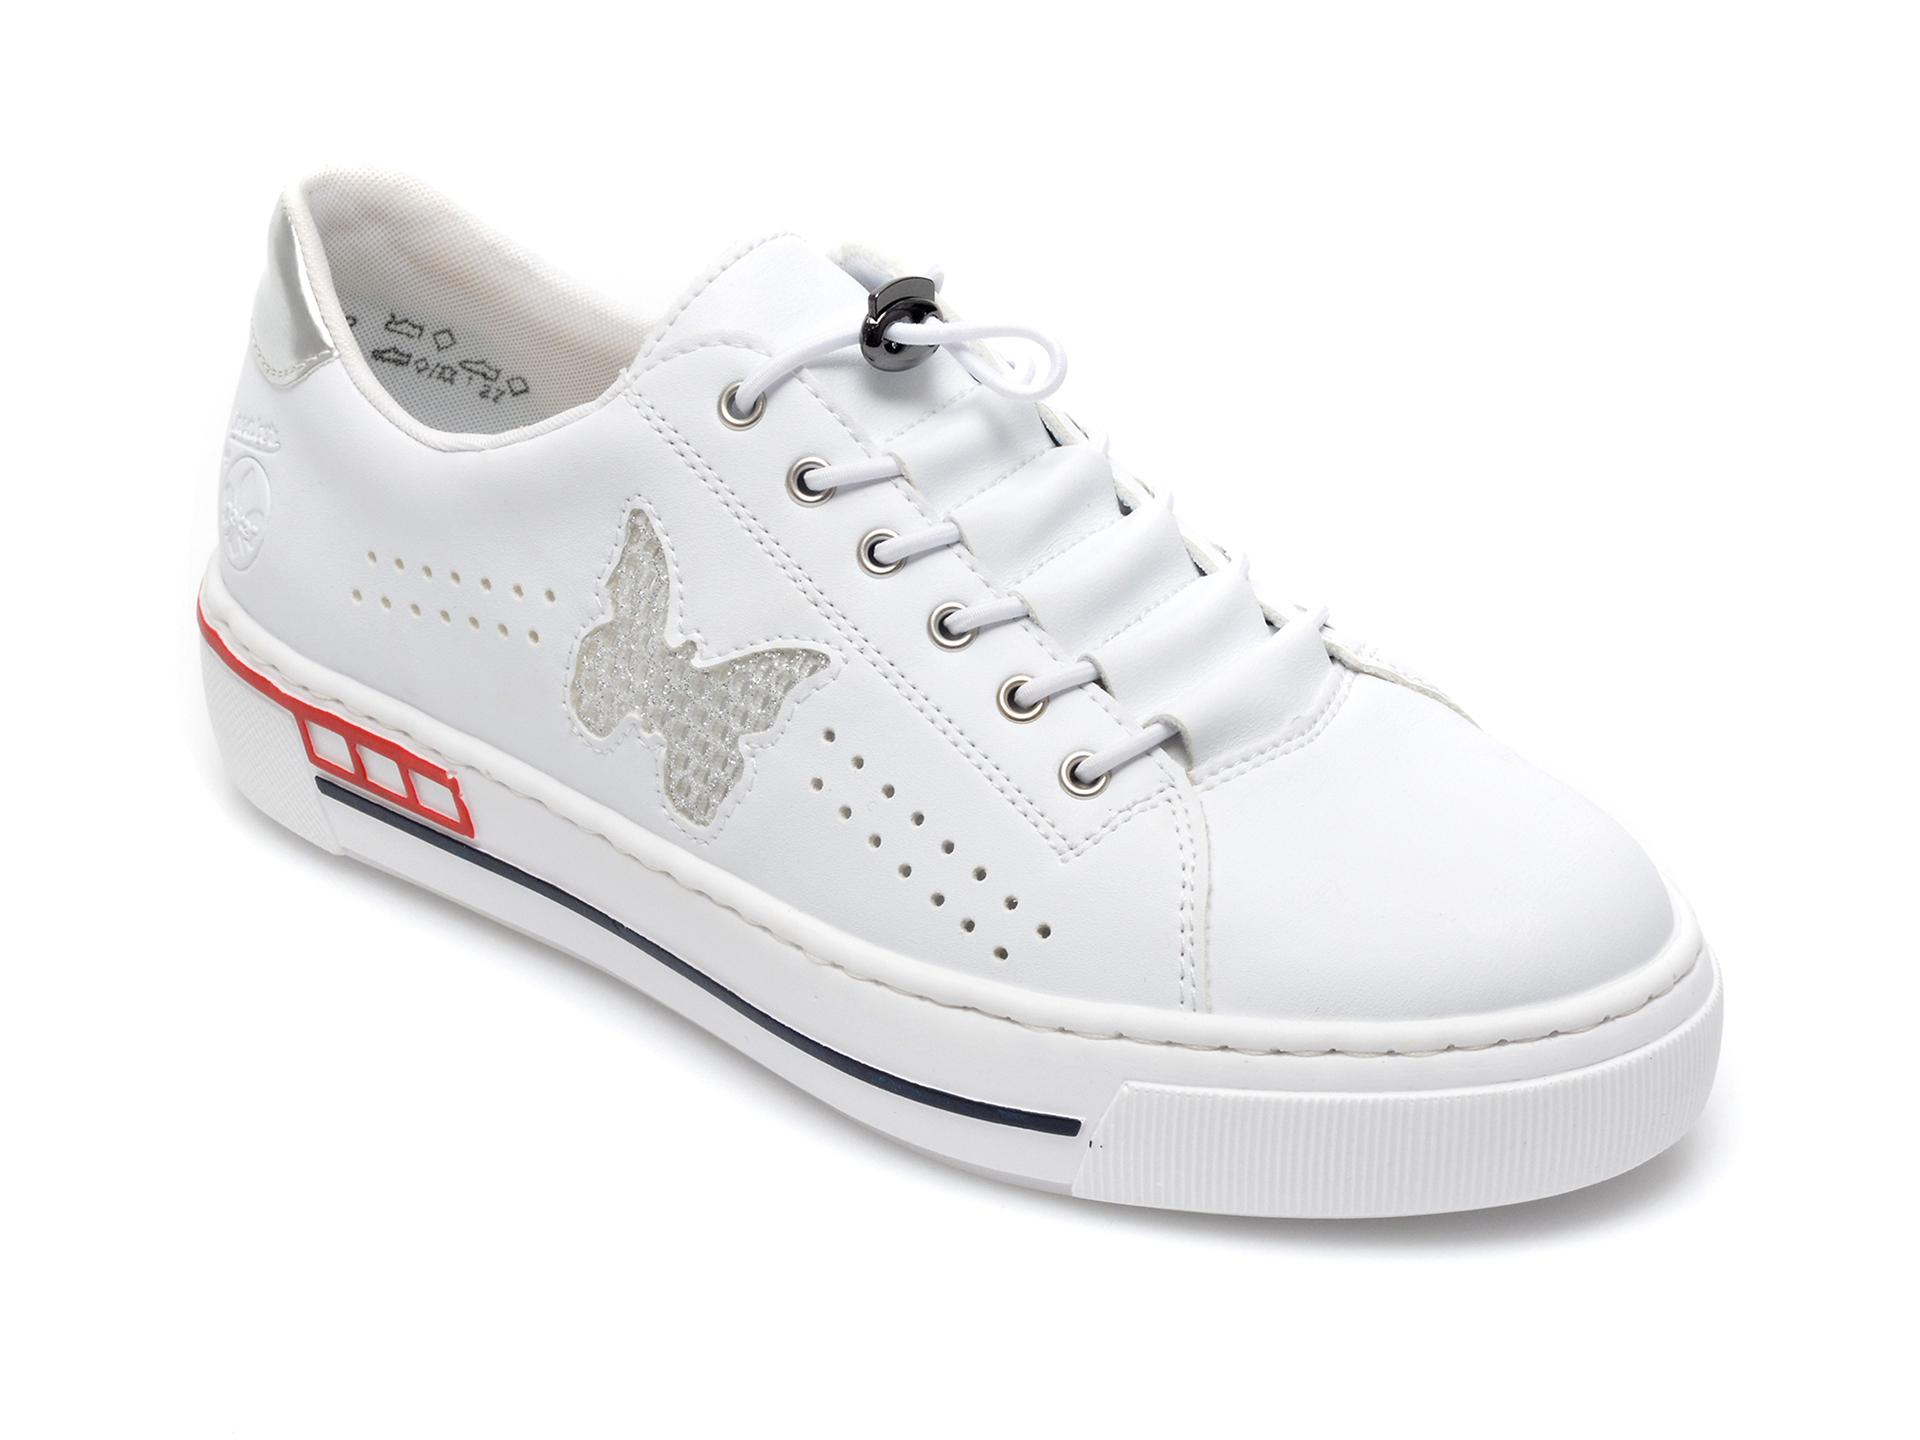 Pantofi sport RIEKER albi, L8857, din piele ecologica imagine otter.ro 2021